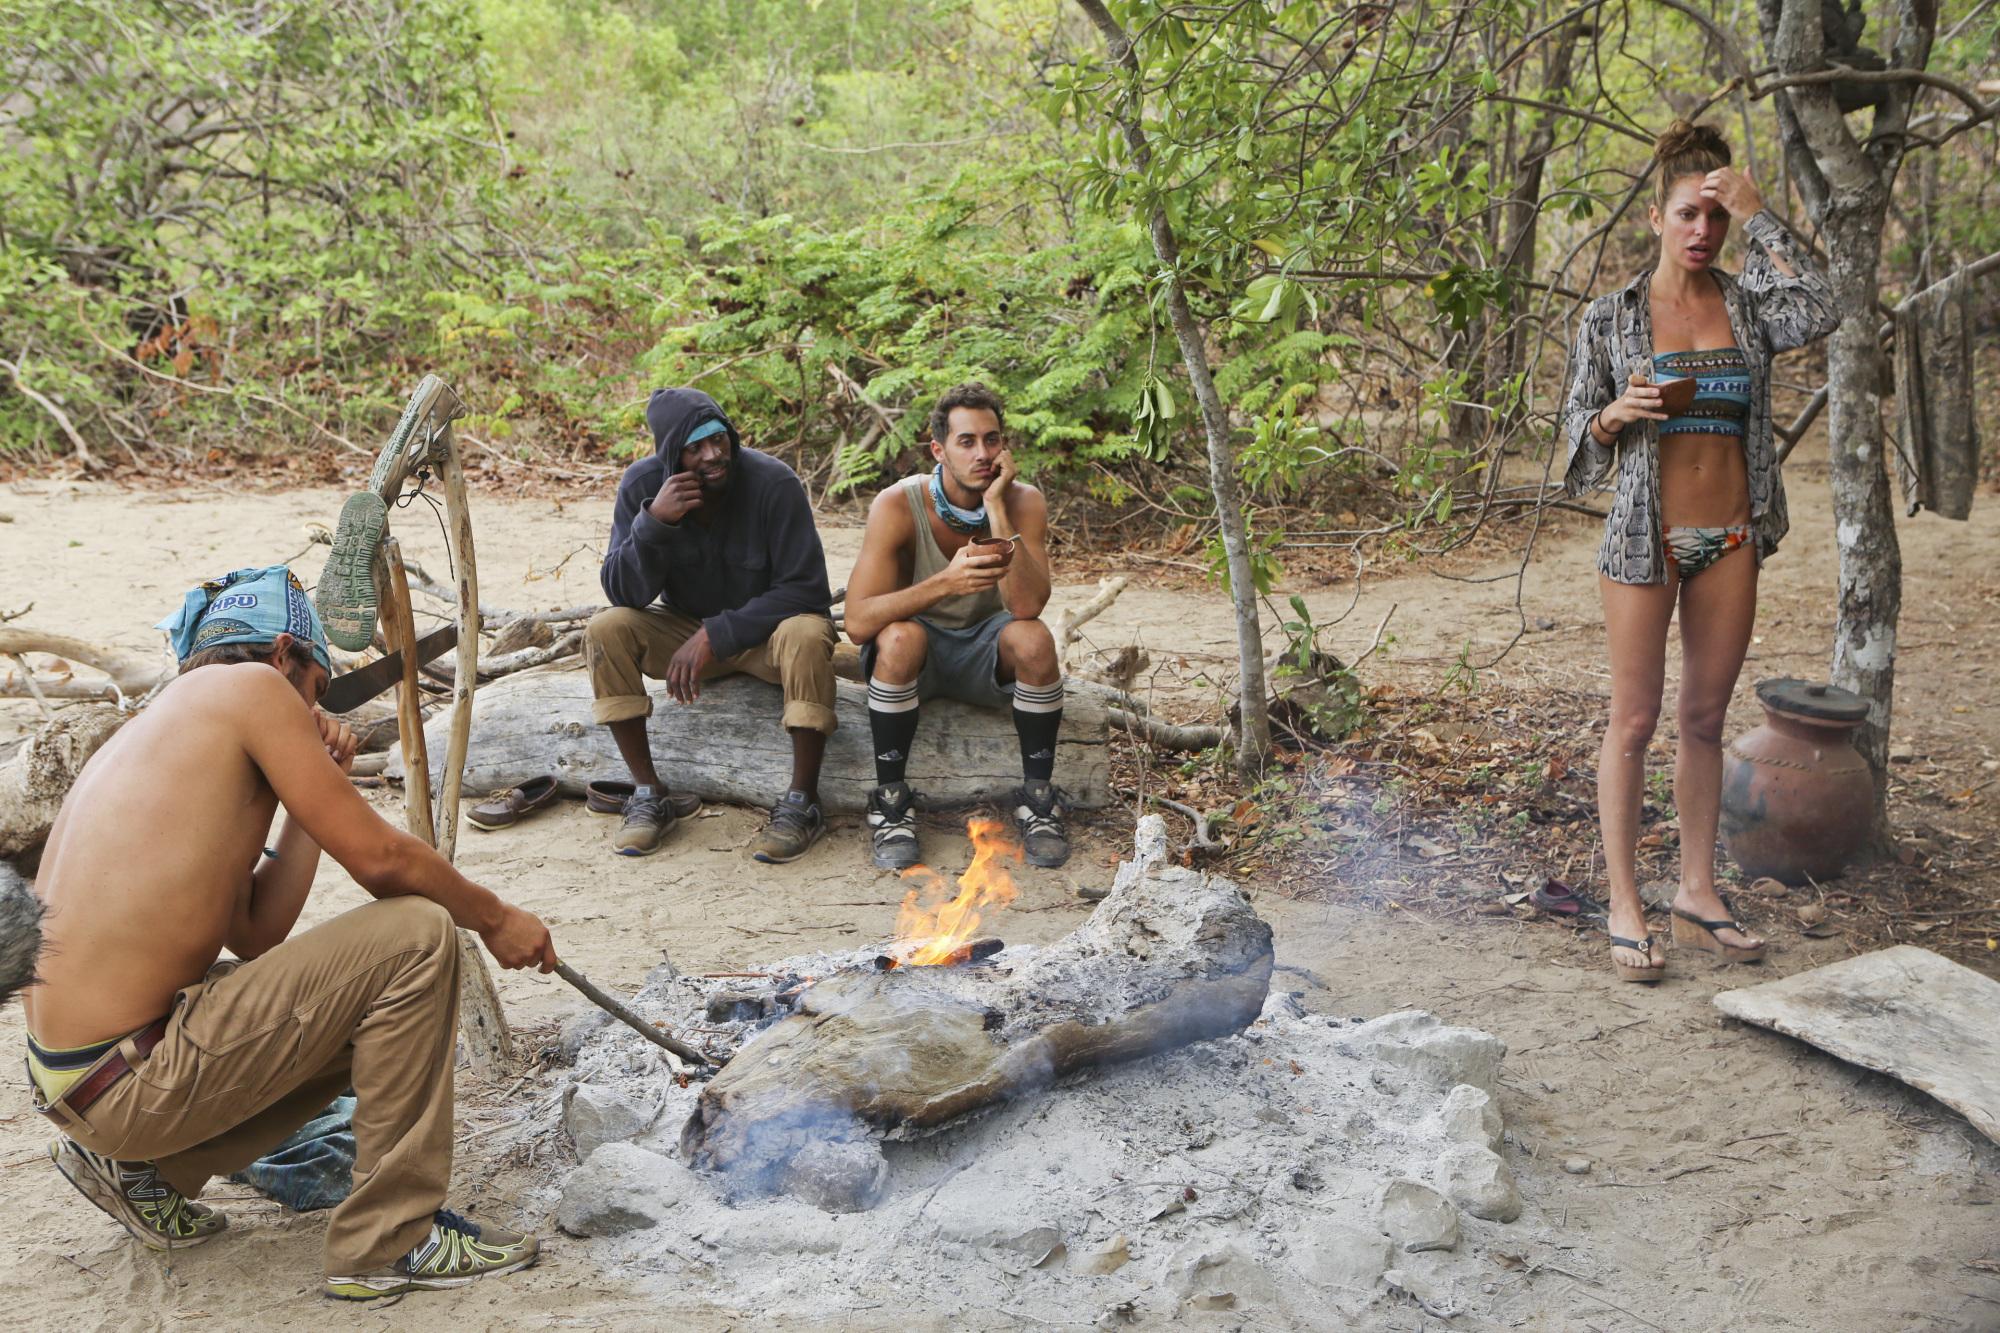 Hunahpu at camp